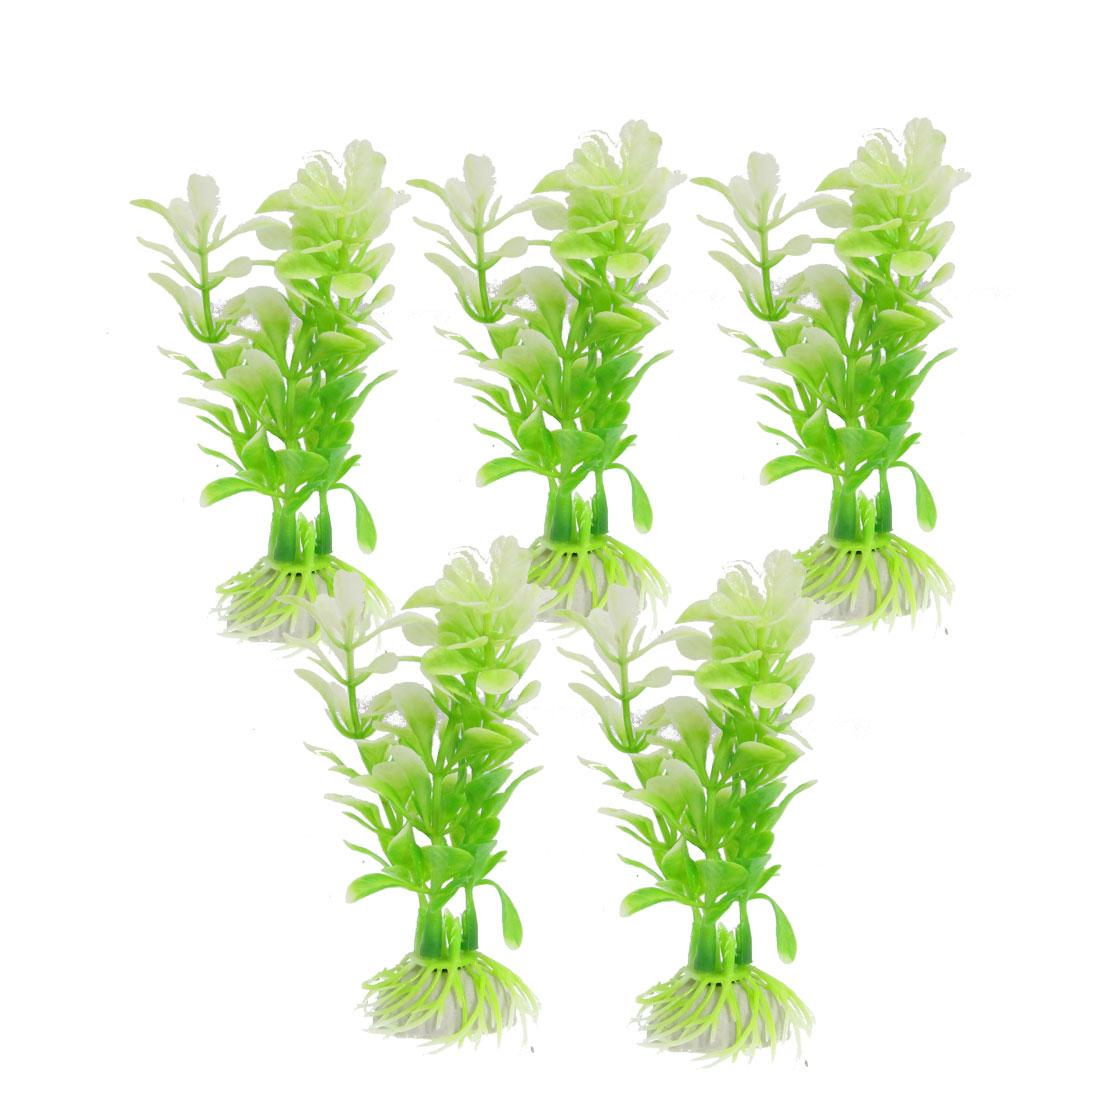 "Fish Tank Ornament 4.3"" Height Green White Plastic Plant 5 Pcs w Base"